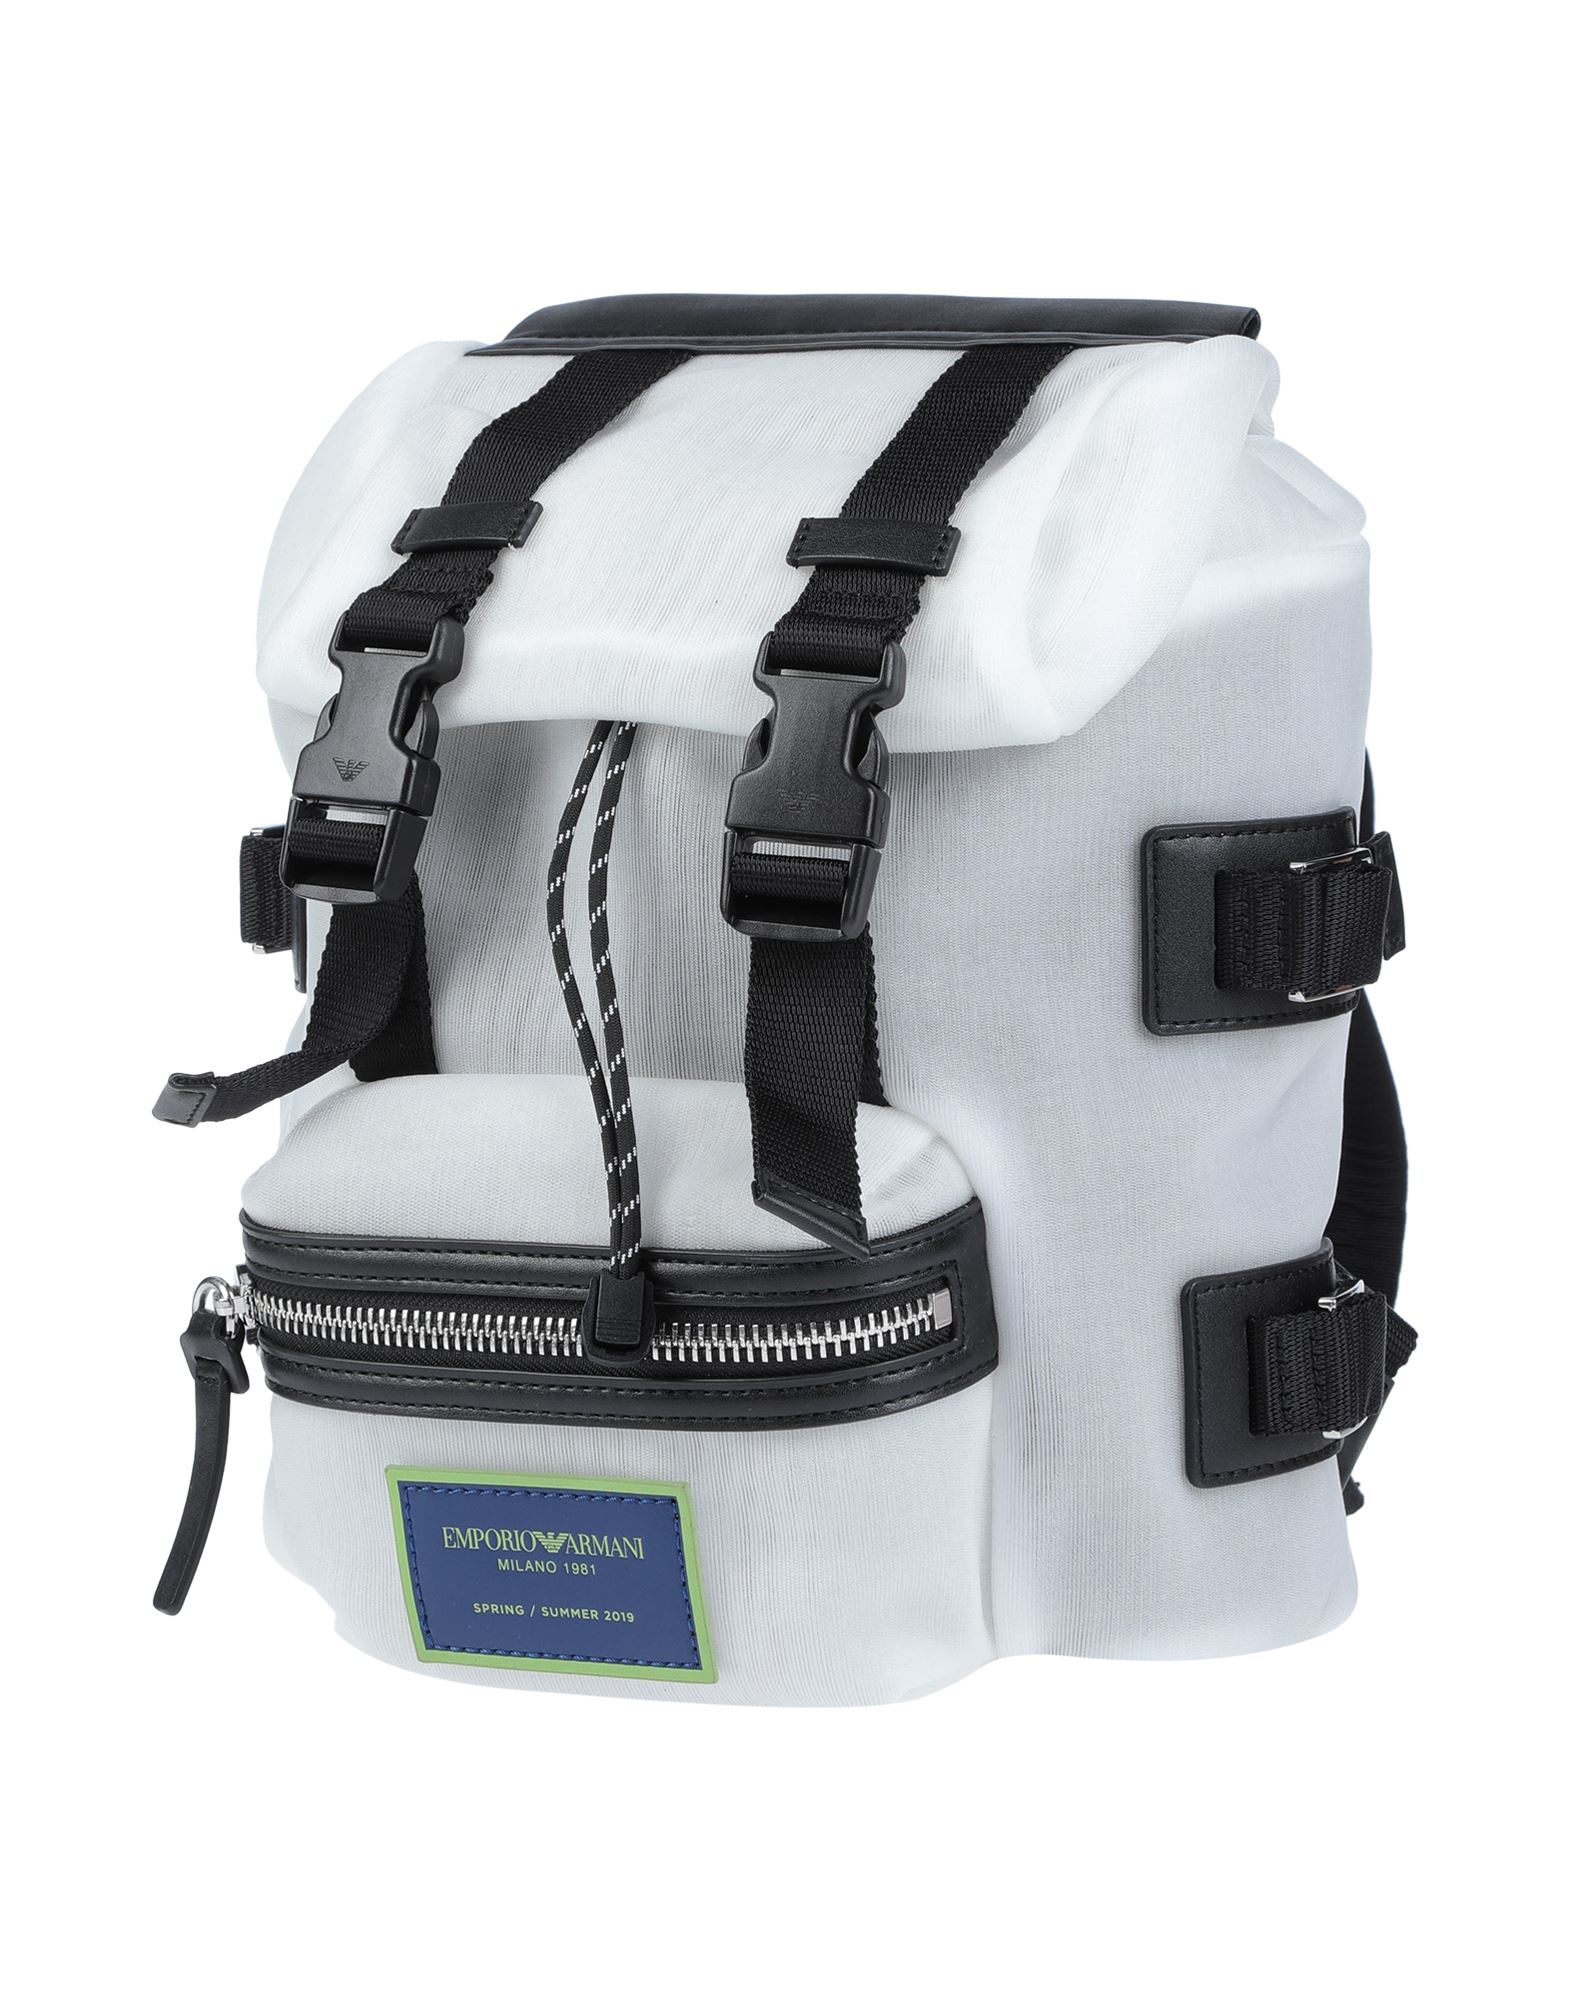 emporio armani деловые сумки EMPORIO ARMANI Рюкзаки и сумки на пояс